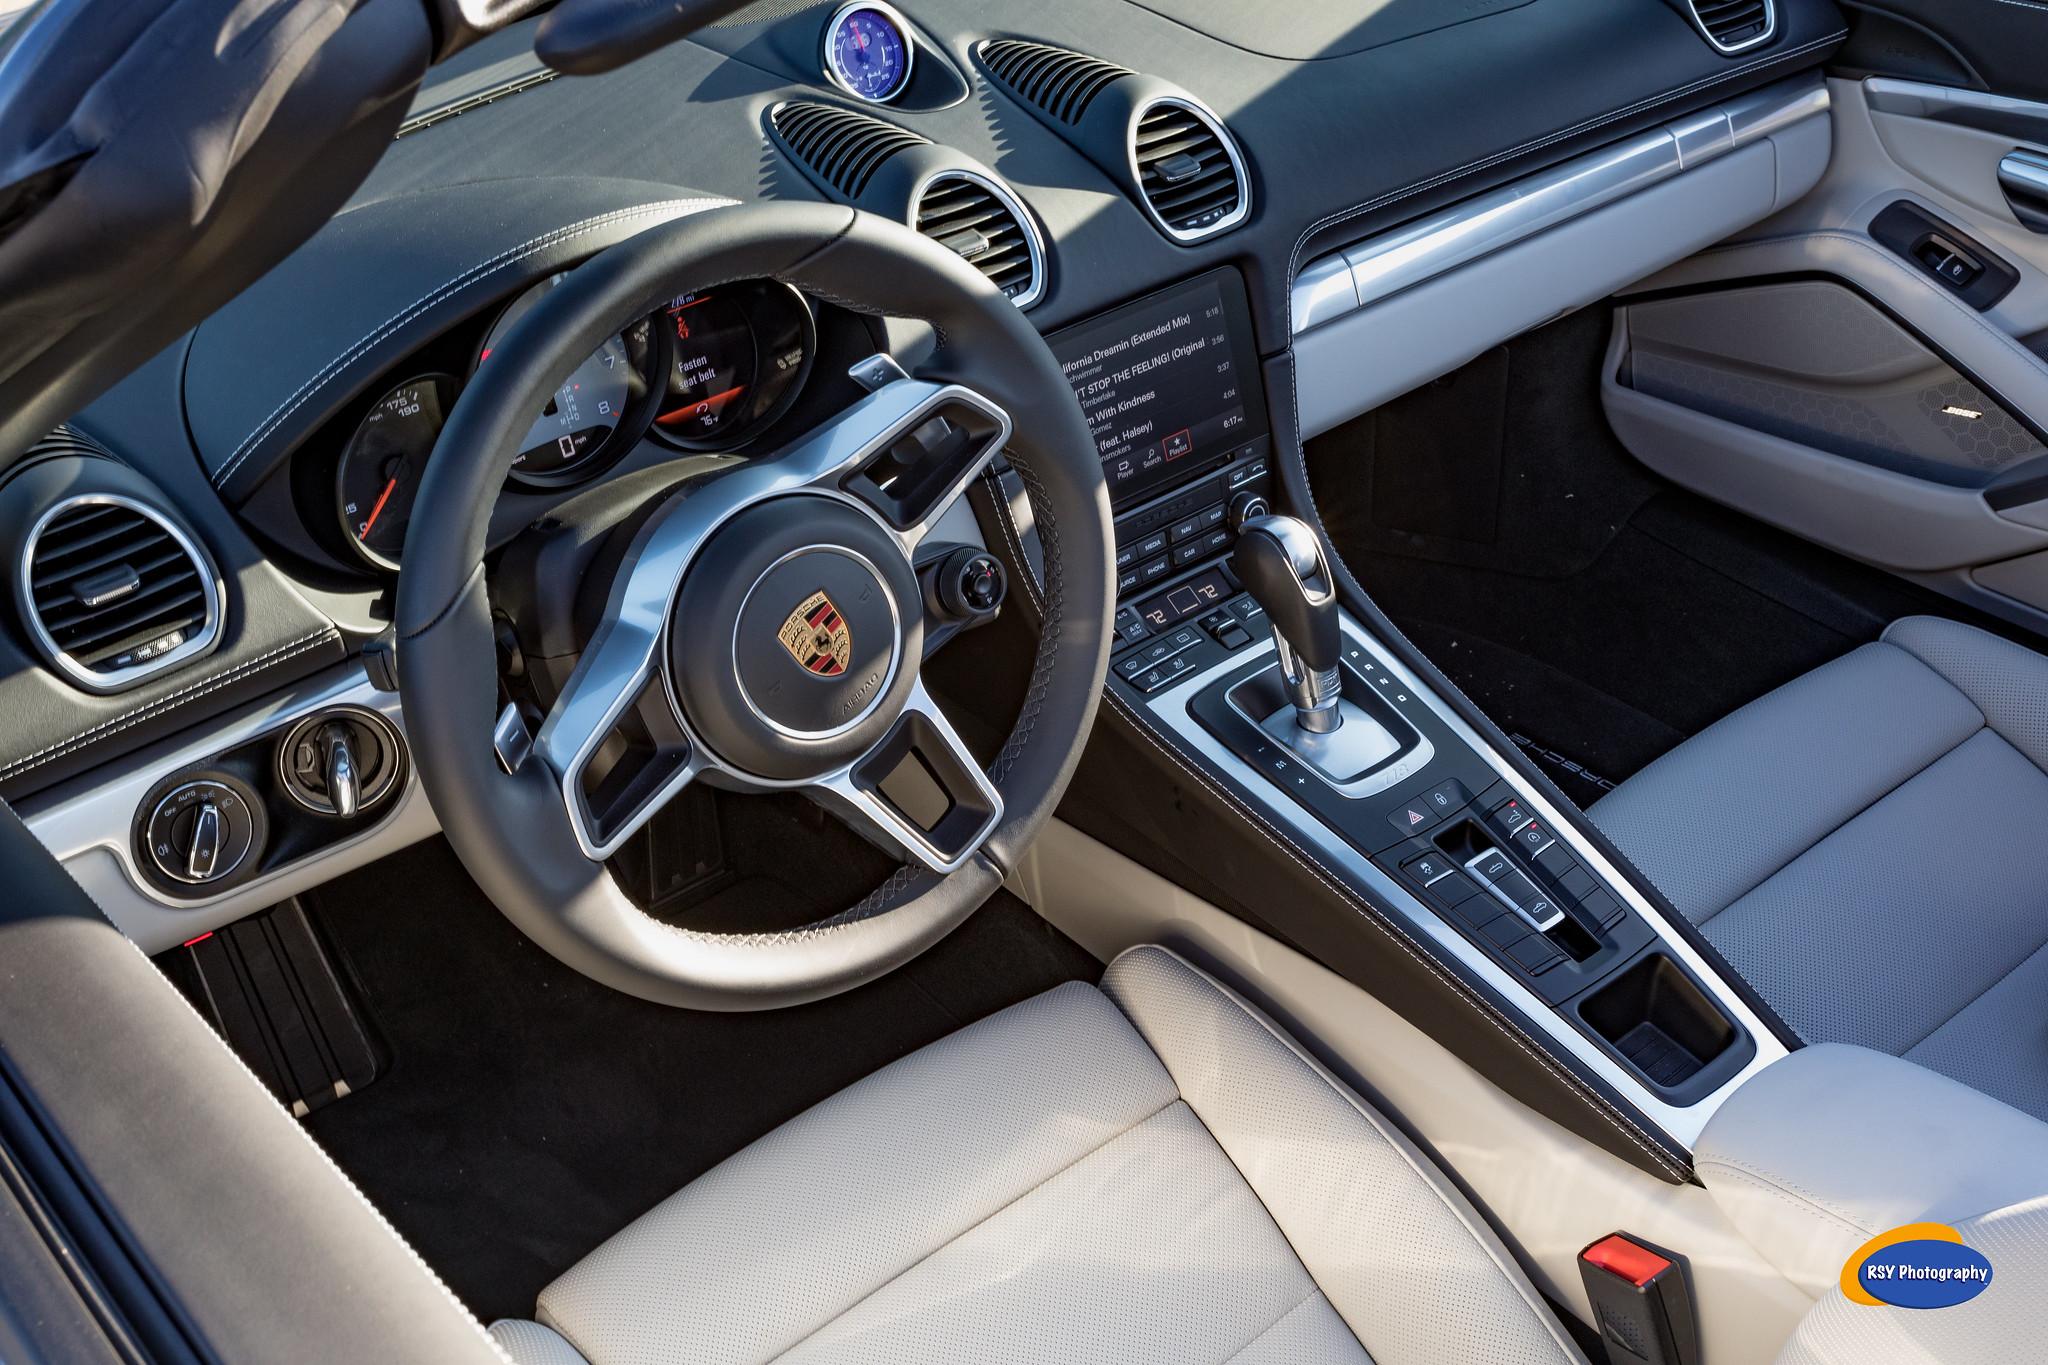 Porsche 718 Boxster >> My Graphie Blue 718 Boxster S